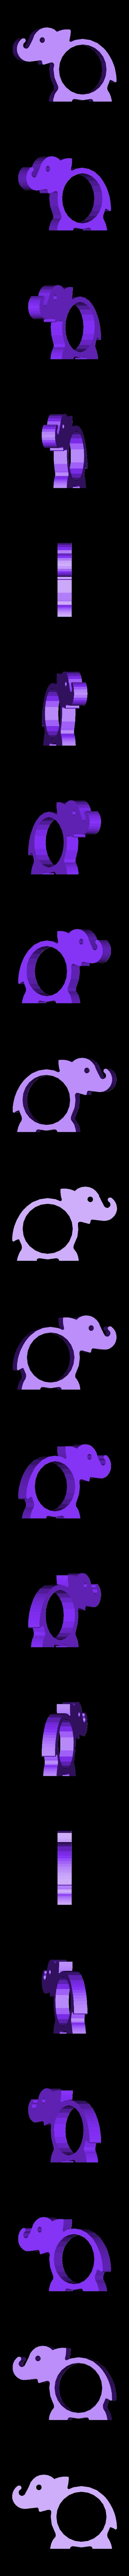 zookins-elephant_fixed.stl Download free STL file Handle for Teapot's Cap • 3D printing model, Ogrod3d